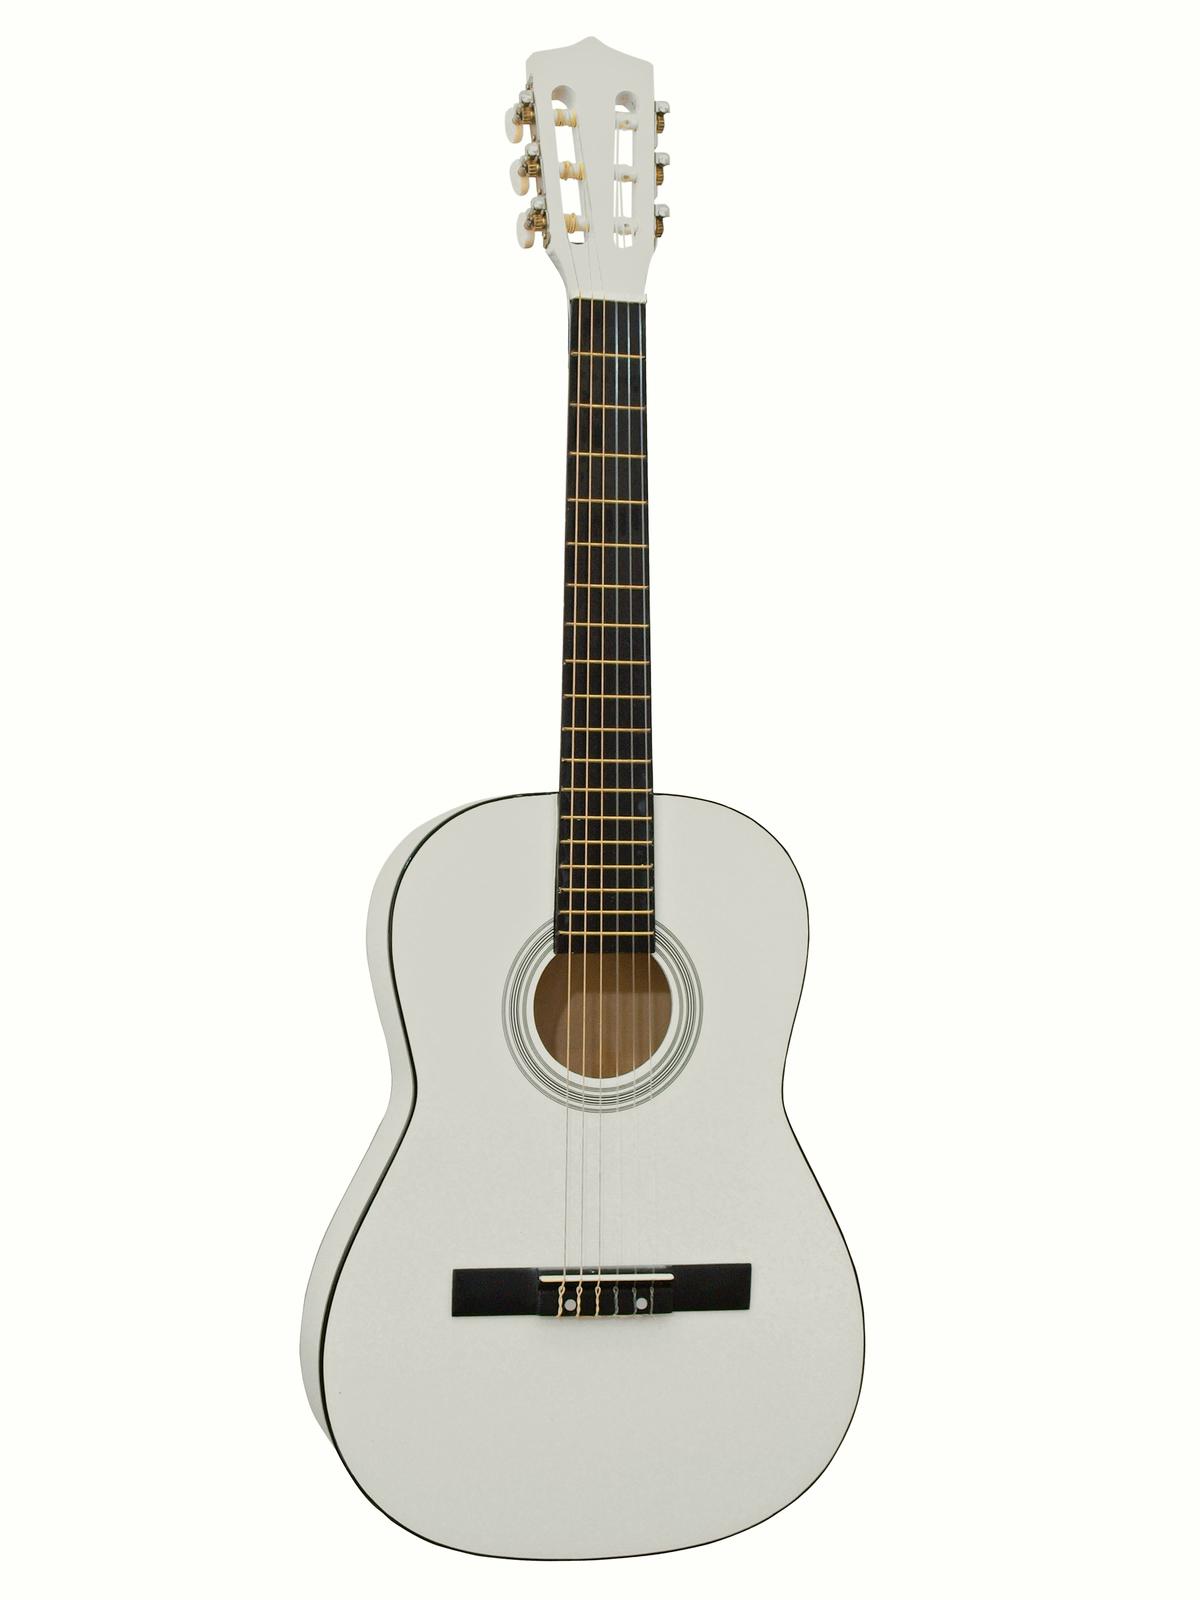 DIMAVERY AC-303 Klassikgitarre 3/4, weiß